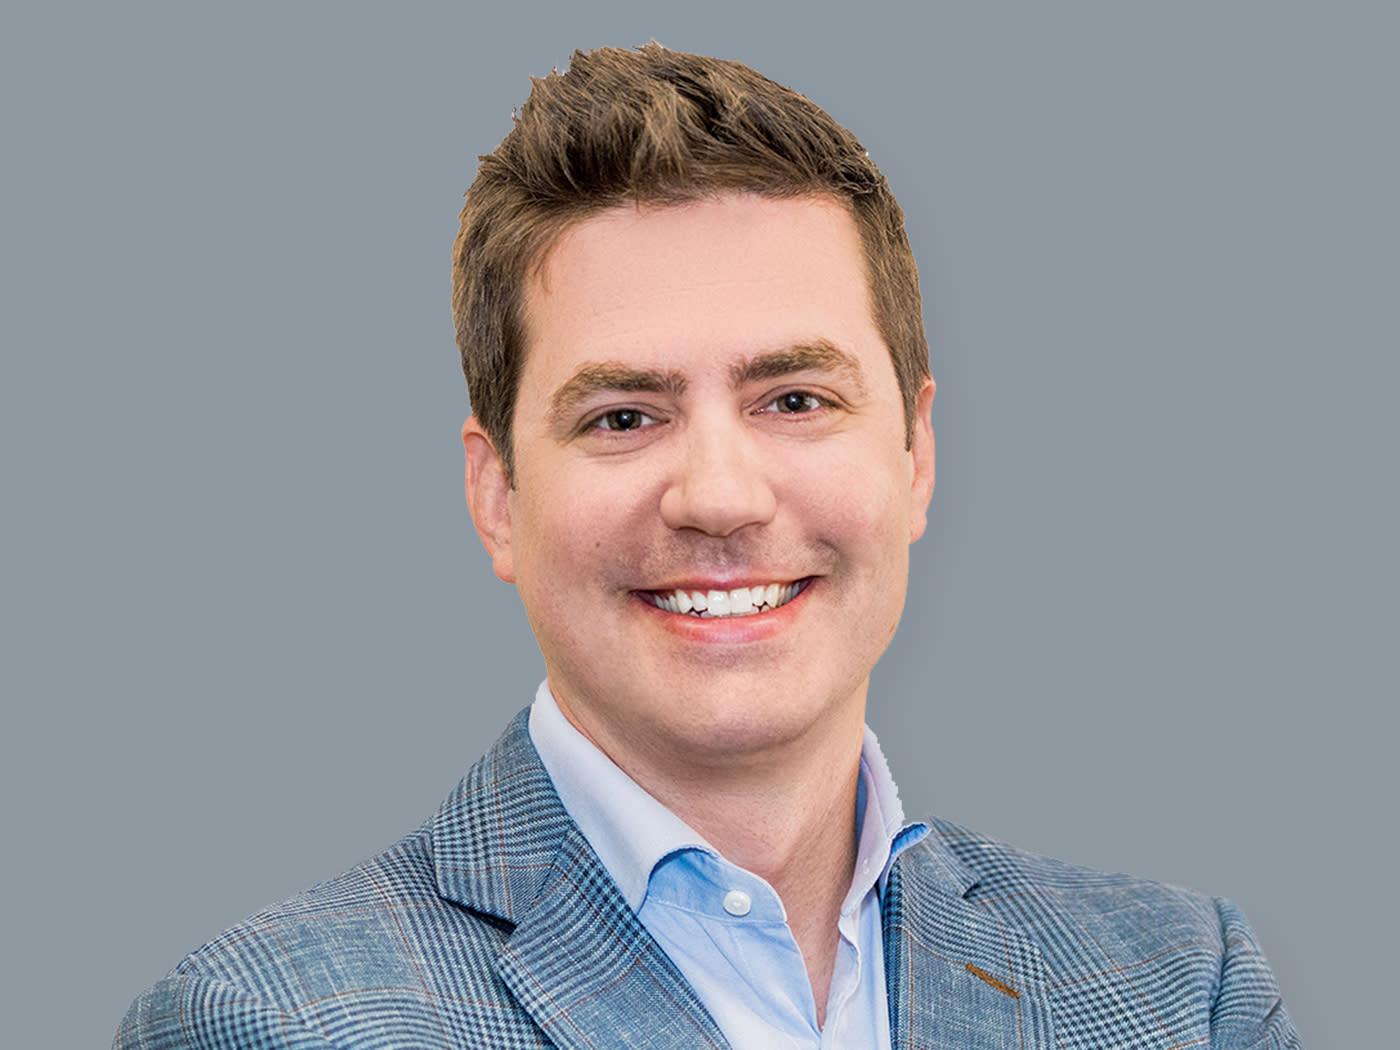 Headshot of CEO Gary Little